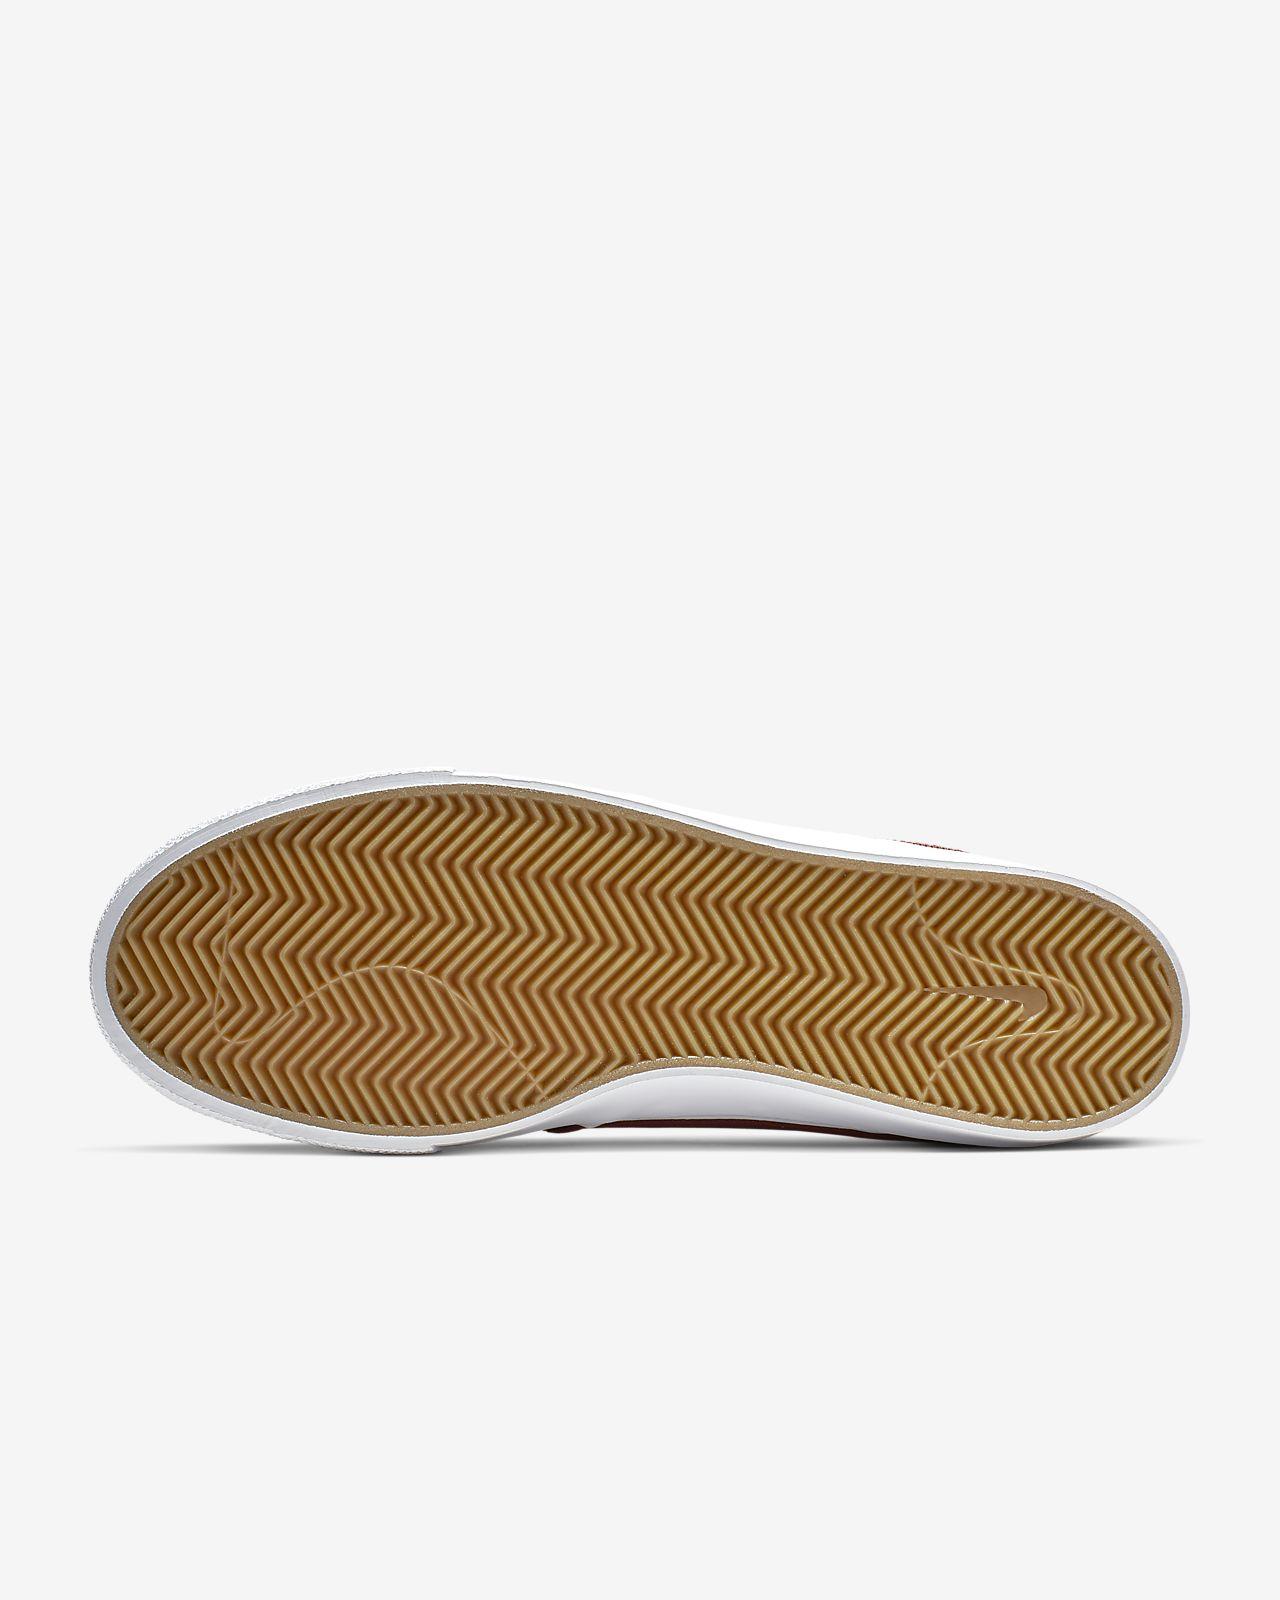 super popular ef939 9ab32 ... Nike SB Zoom Stefan Janoski Canvas RM Skate Shoe